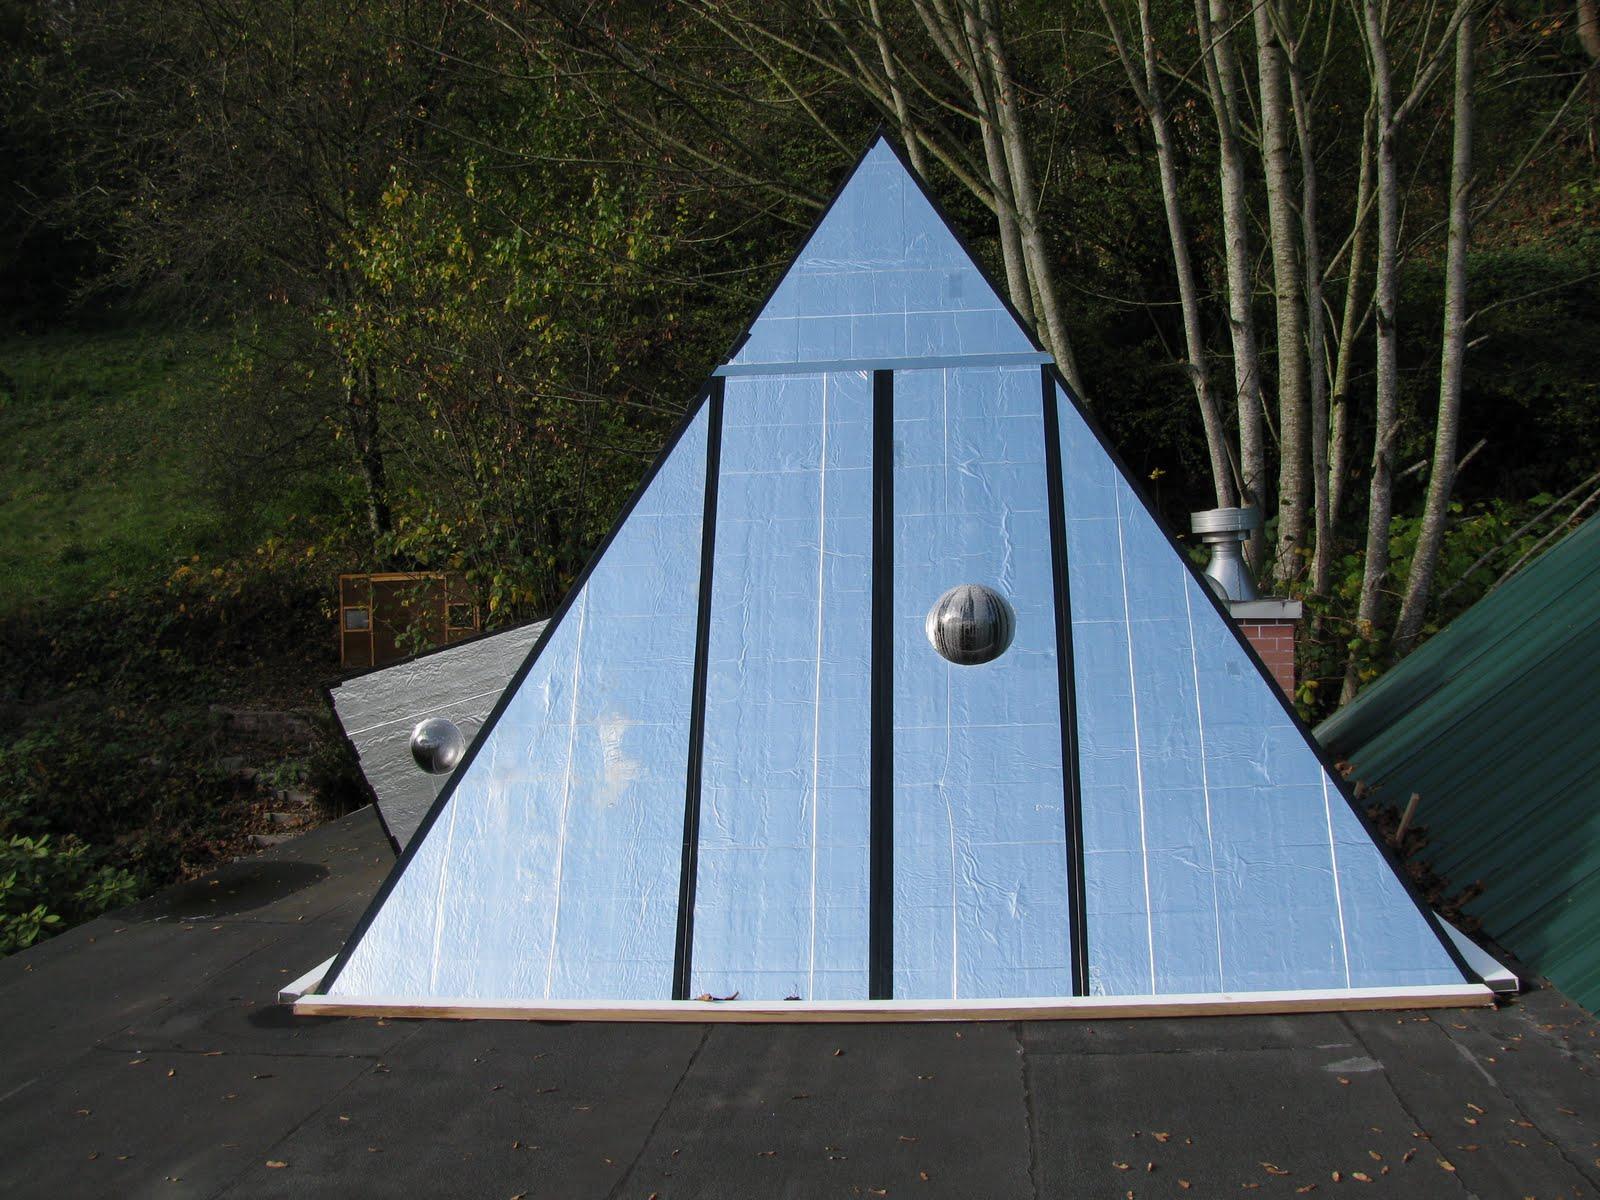 Paul's Pyramid